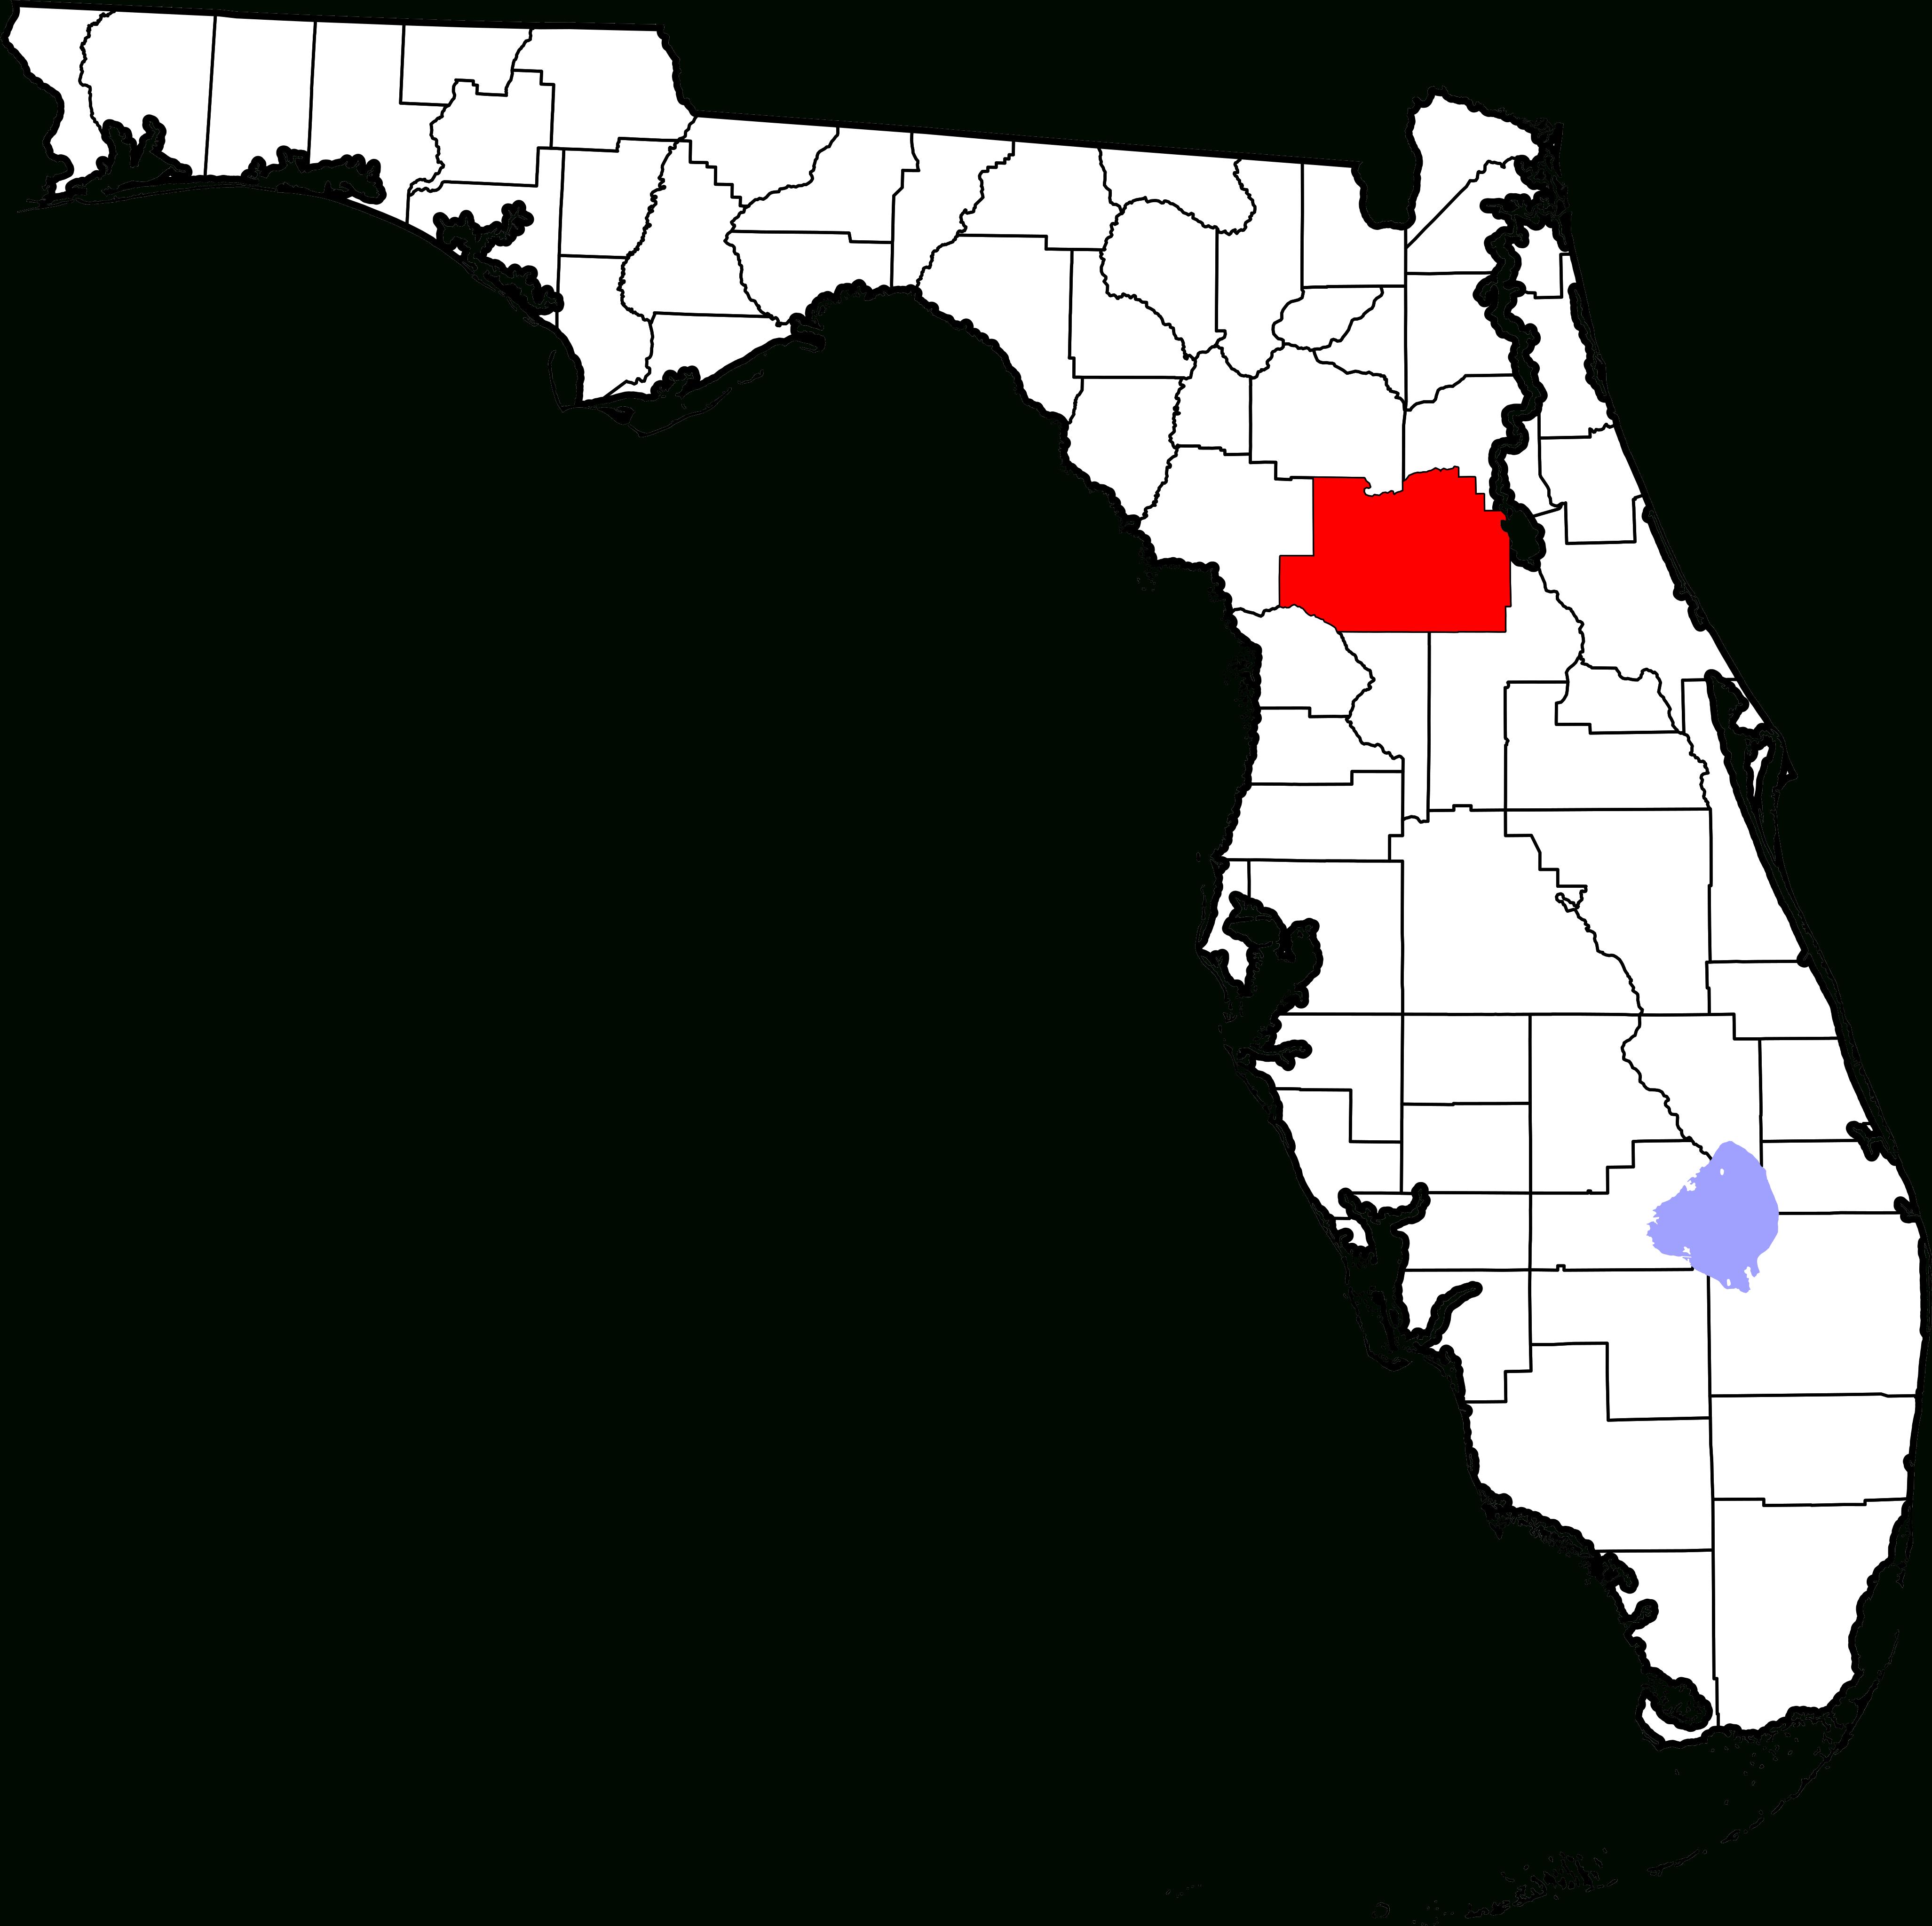 File:map Of Florida Highlighting Marion County.svg - Wikipedia - Ocklawaha Florida Map